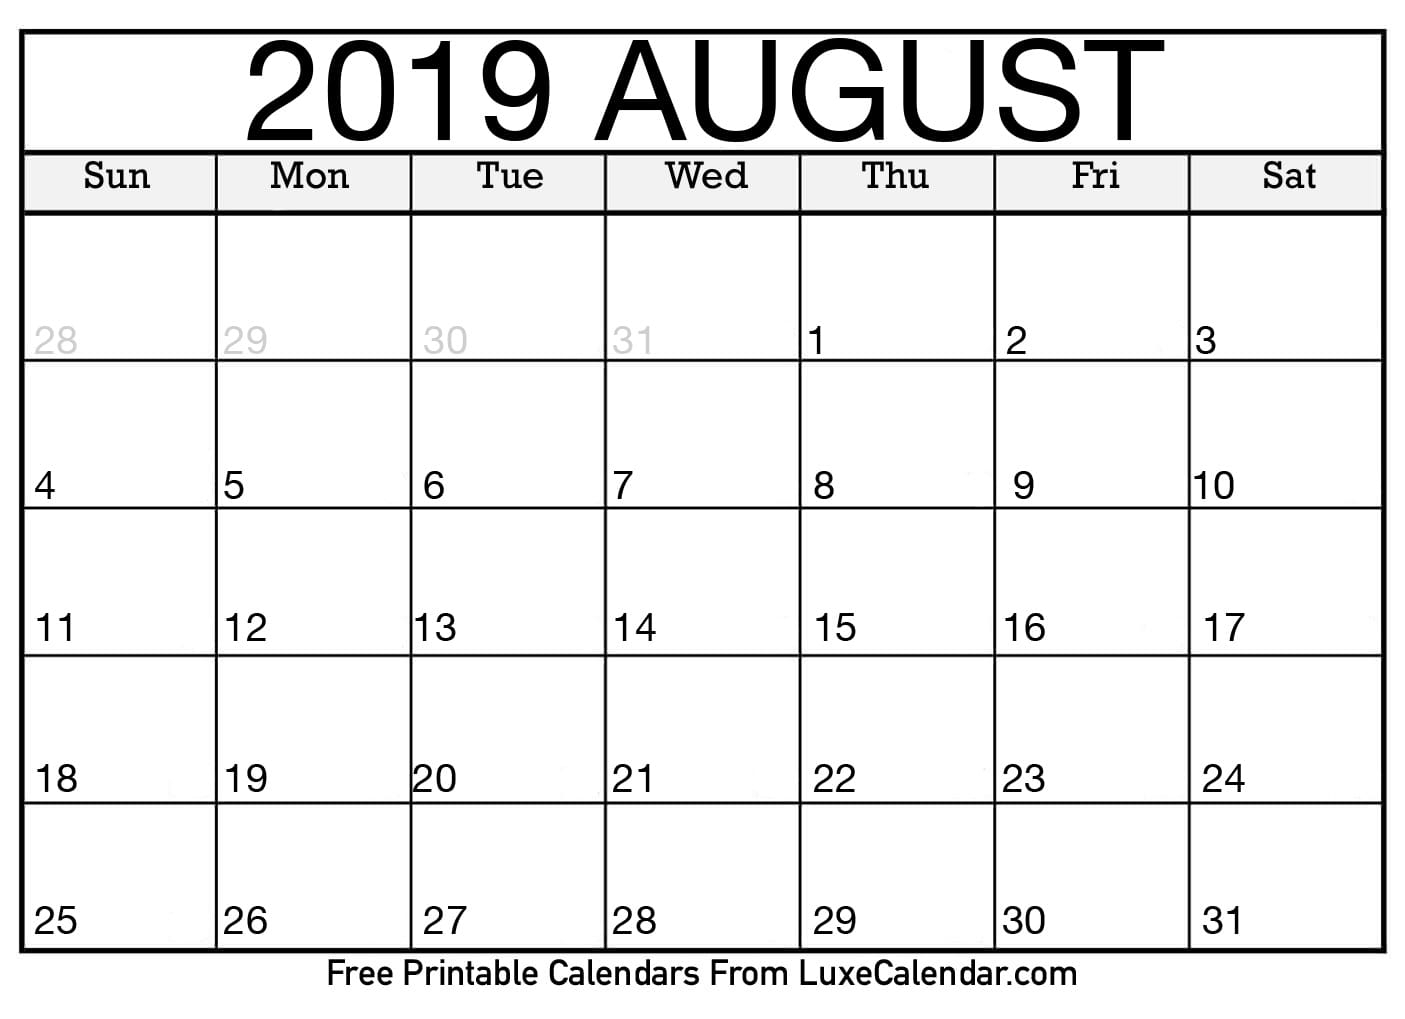 Blank August 2019 Calendar Template - Printable Calendar 2019| Blank with Blank Calendar Template For August